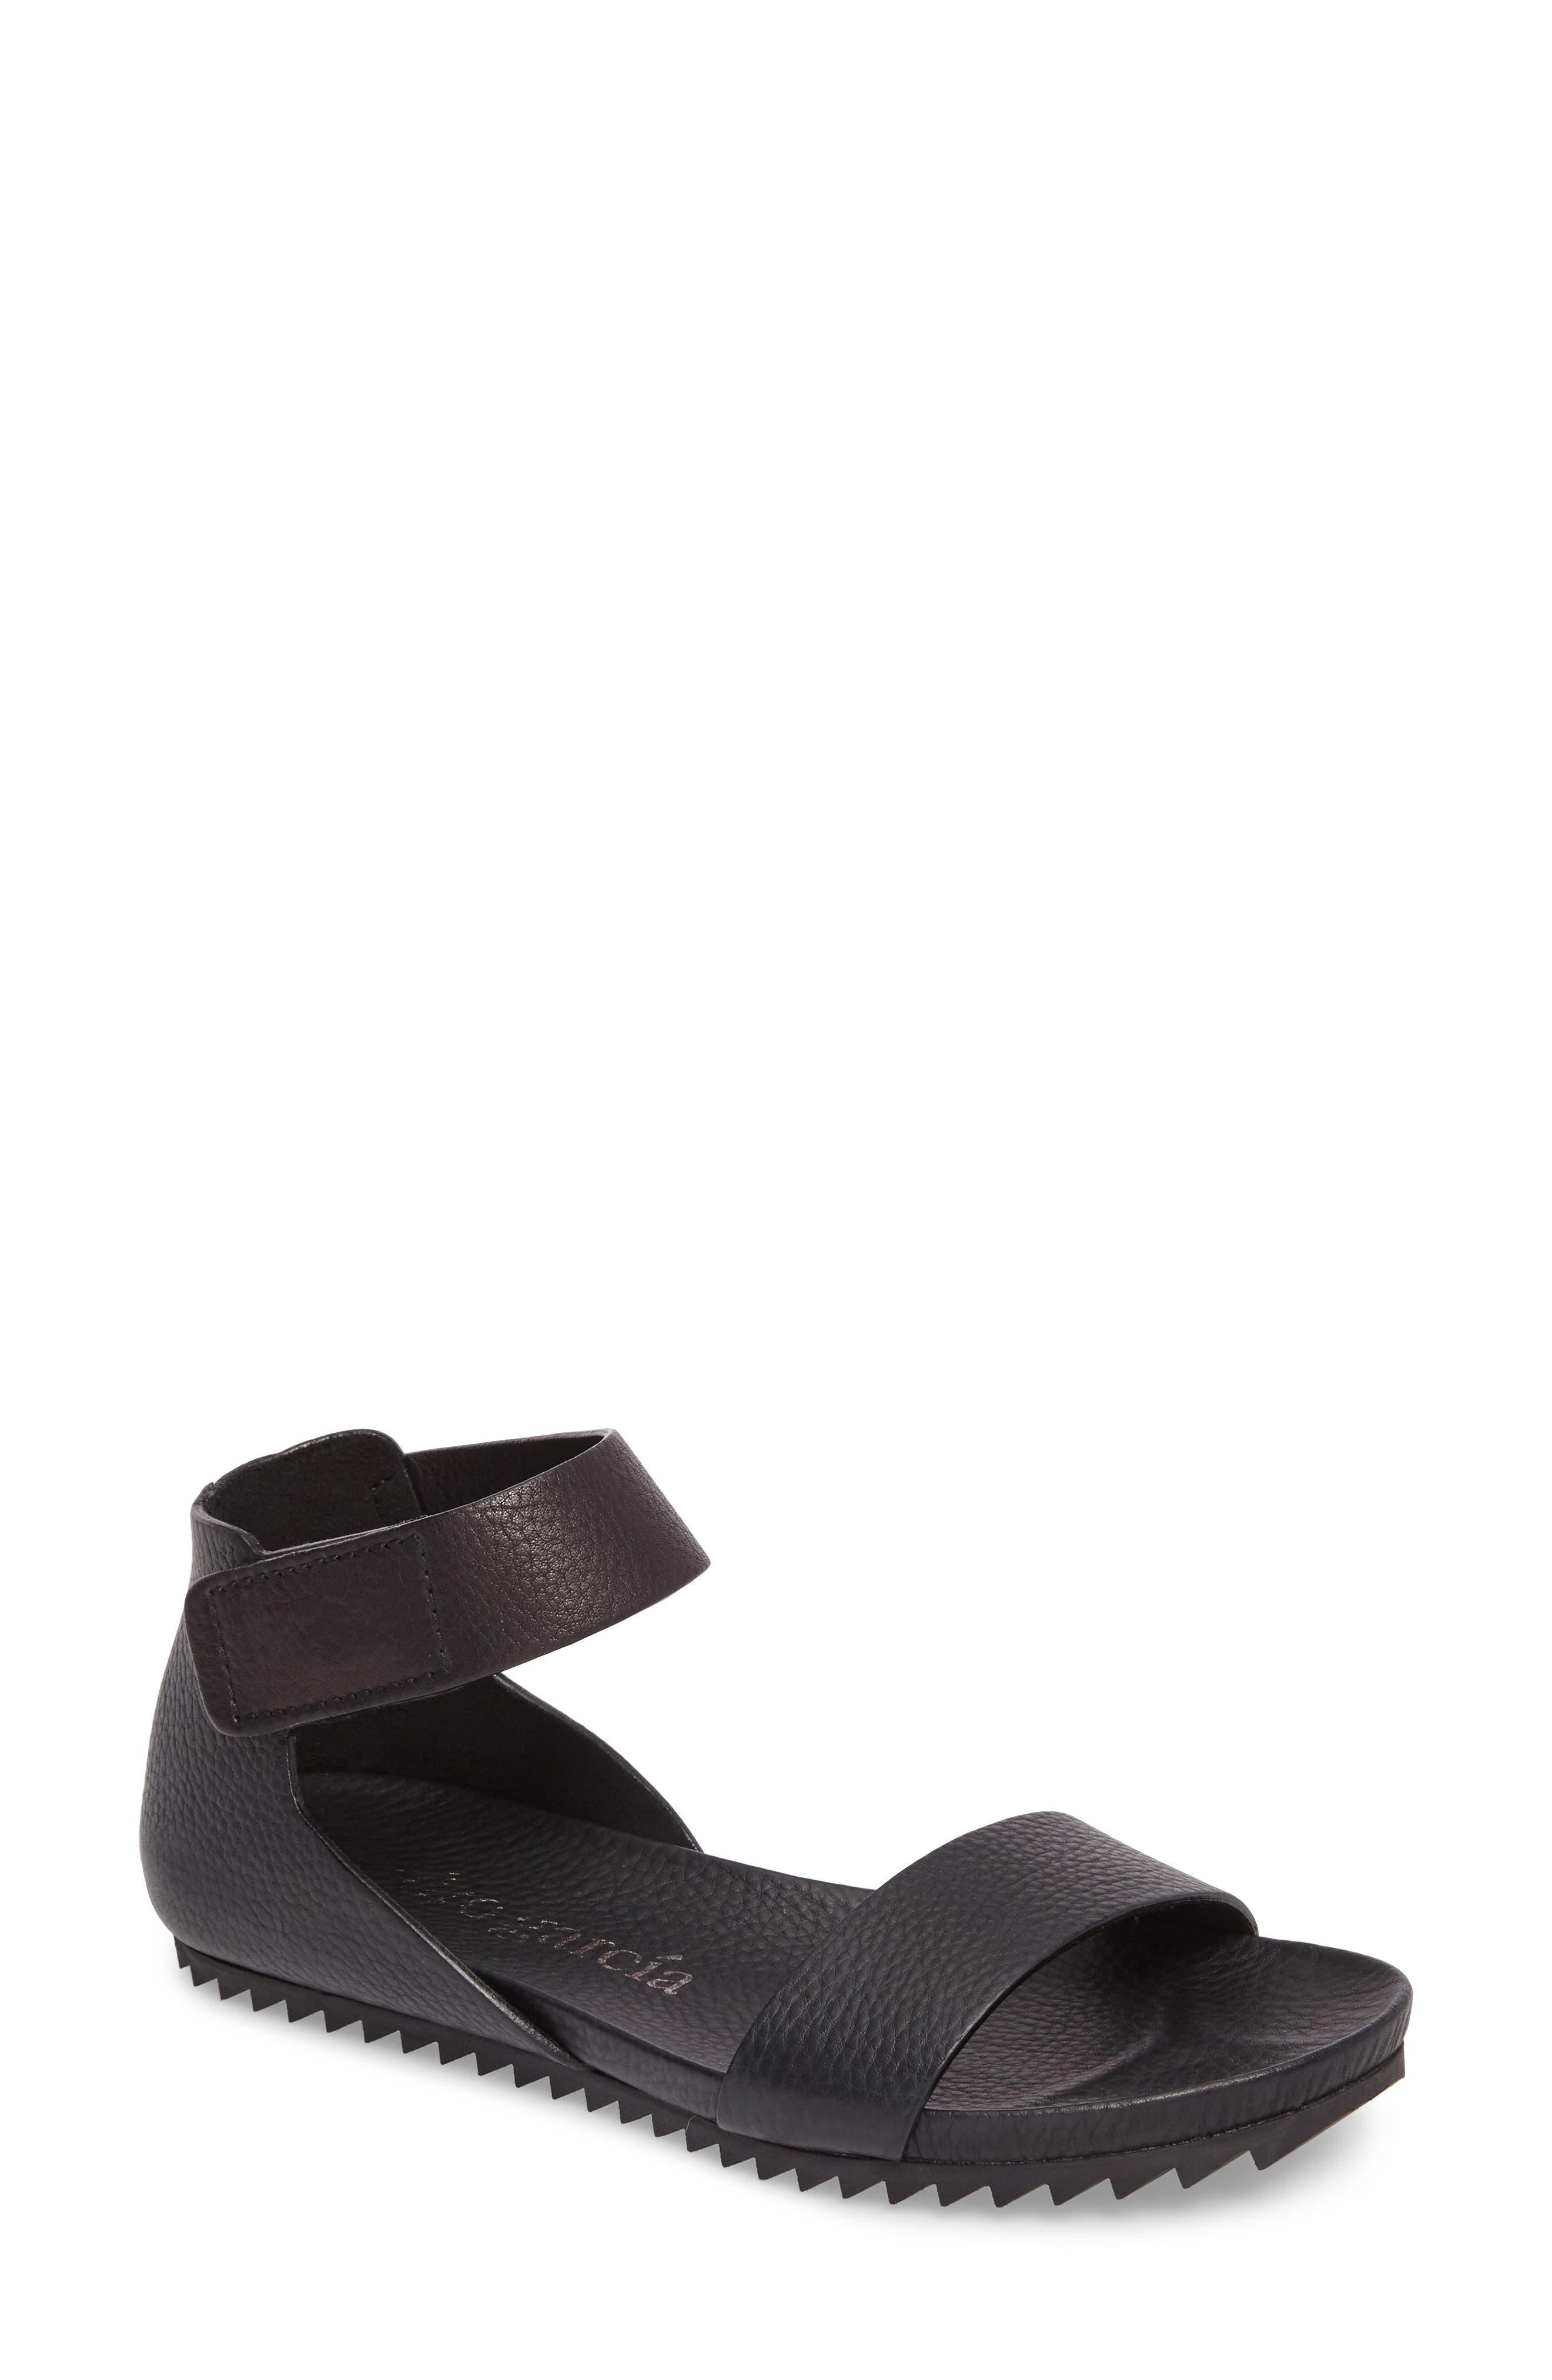 Alternate Image 1 Selected - Pedro Garcia Jalila Ankle Strap Sandal (Women) (Nordstrom Exclusive)